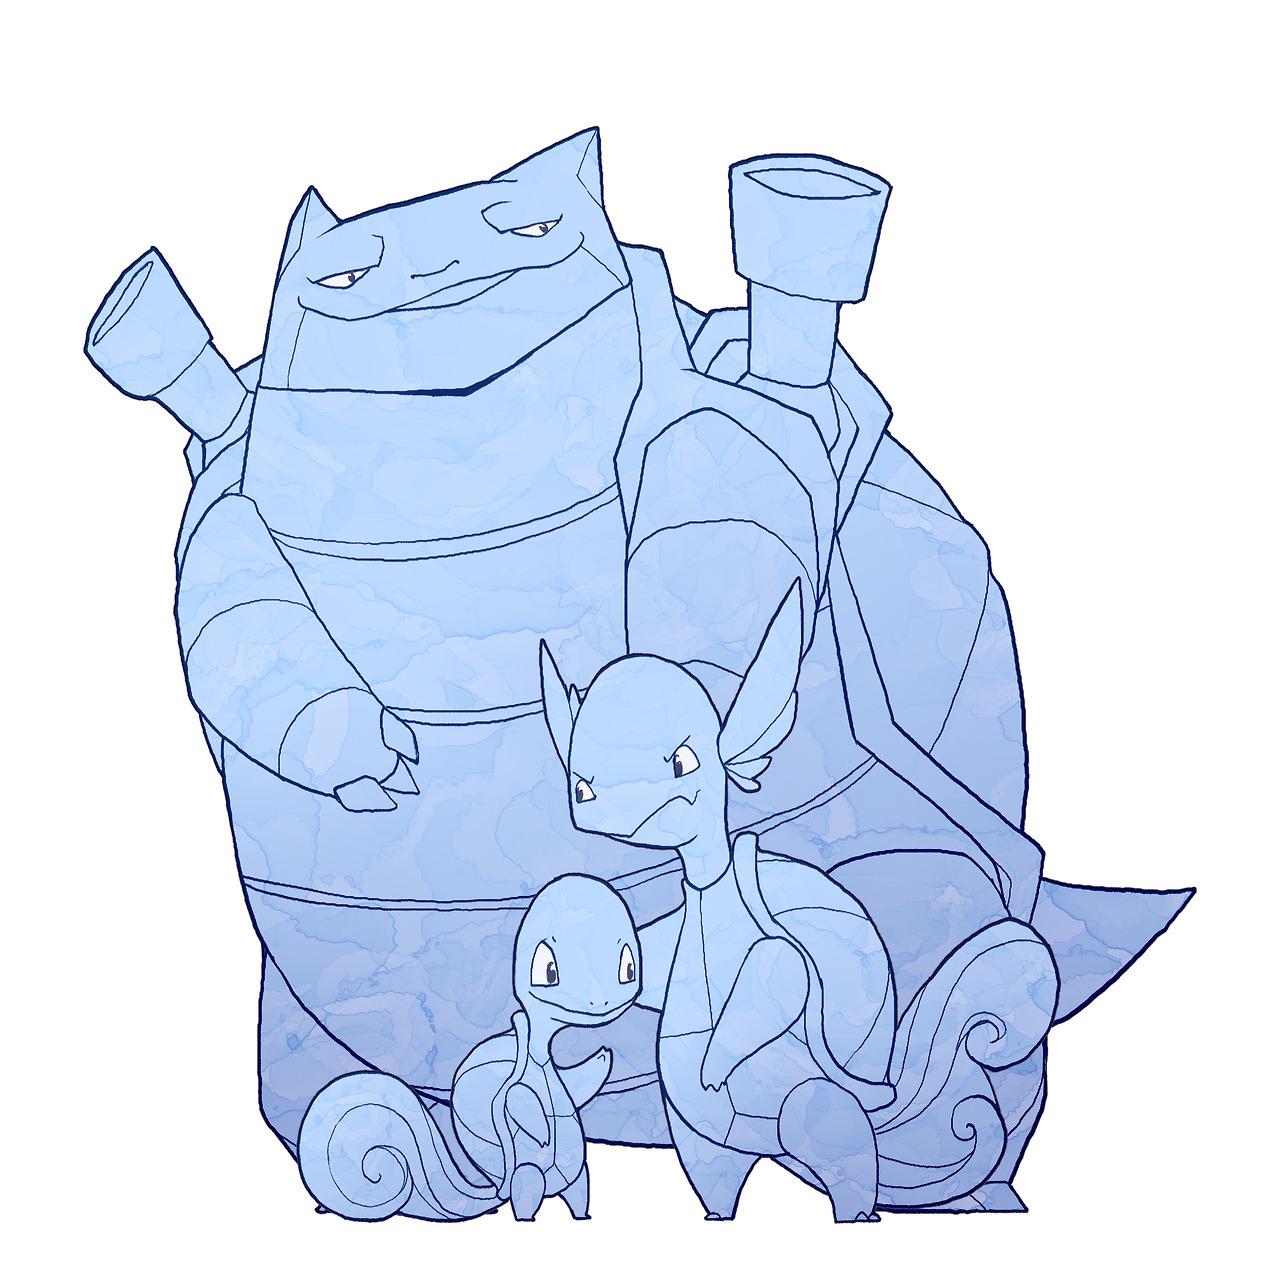 The Family Toise